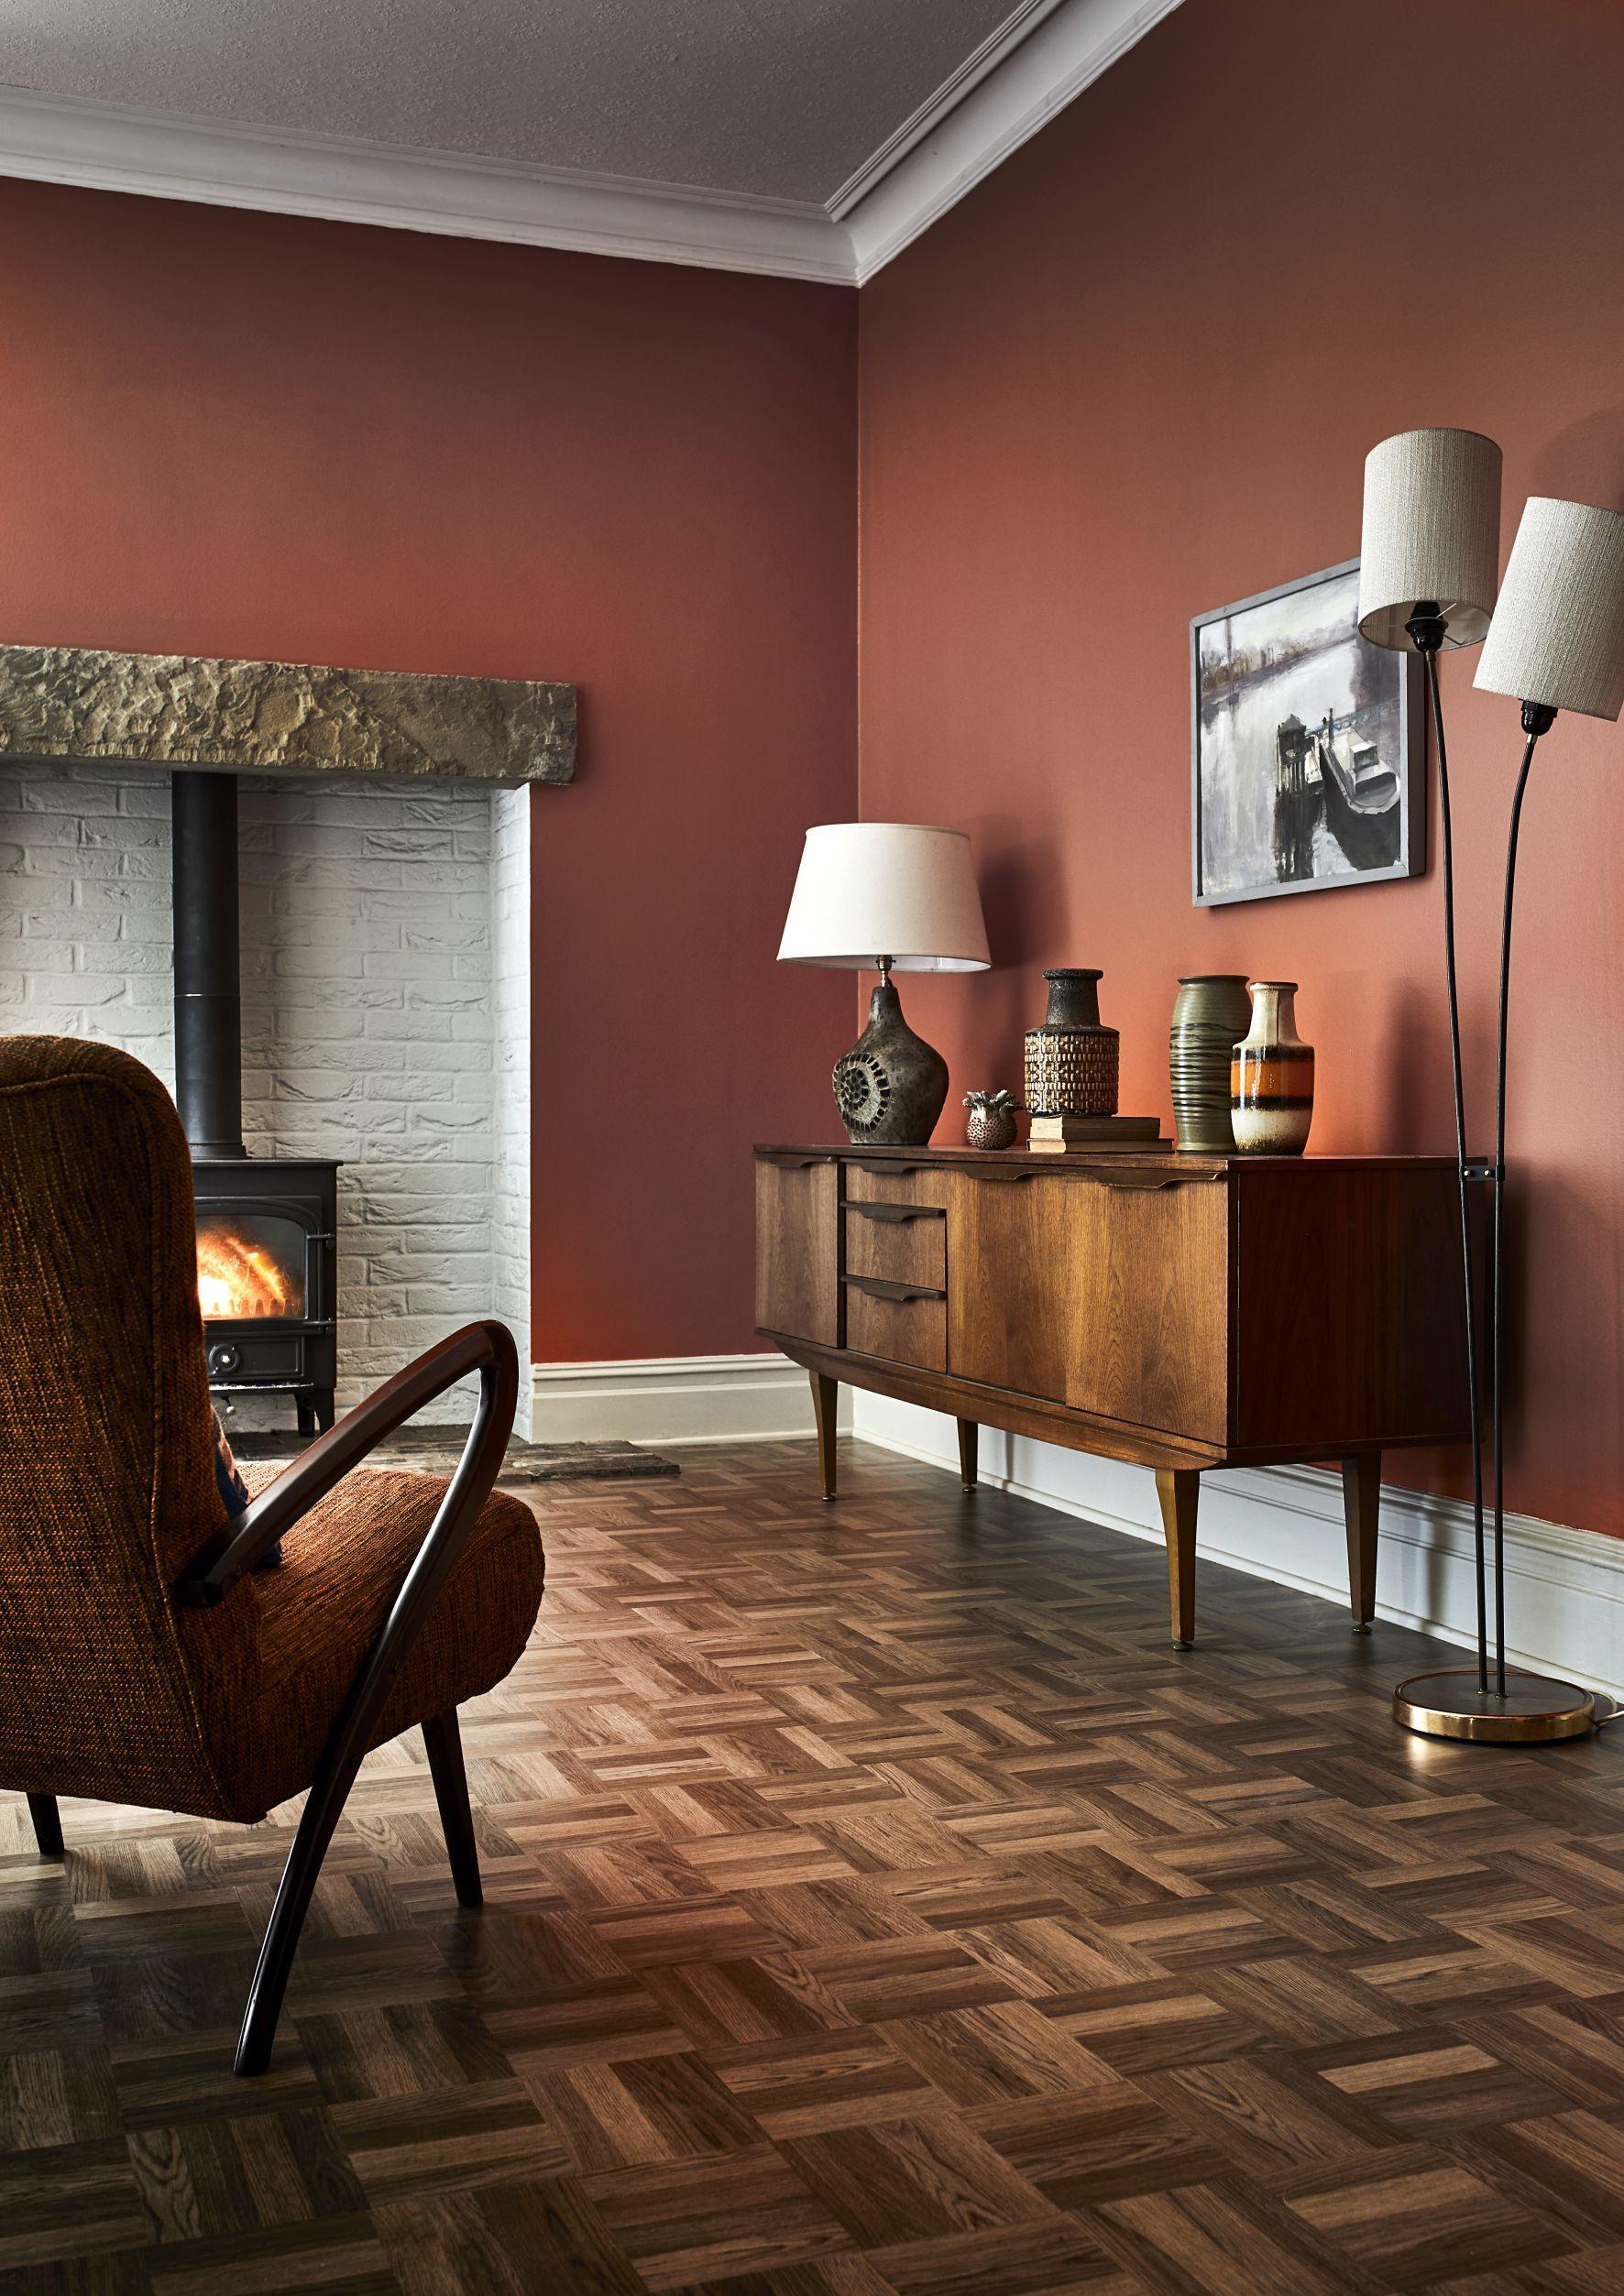 19 Dark And Atmospheric Decorating Ideas Living Room Orange